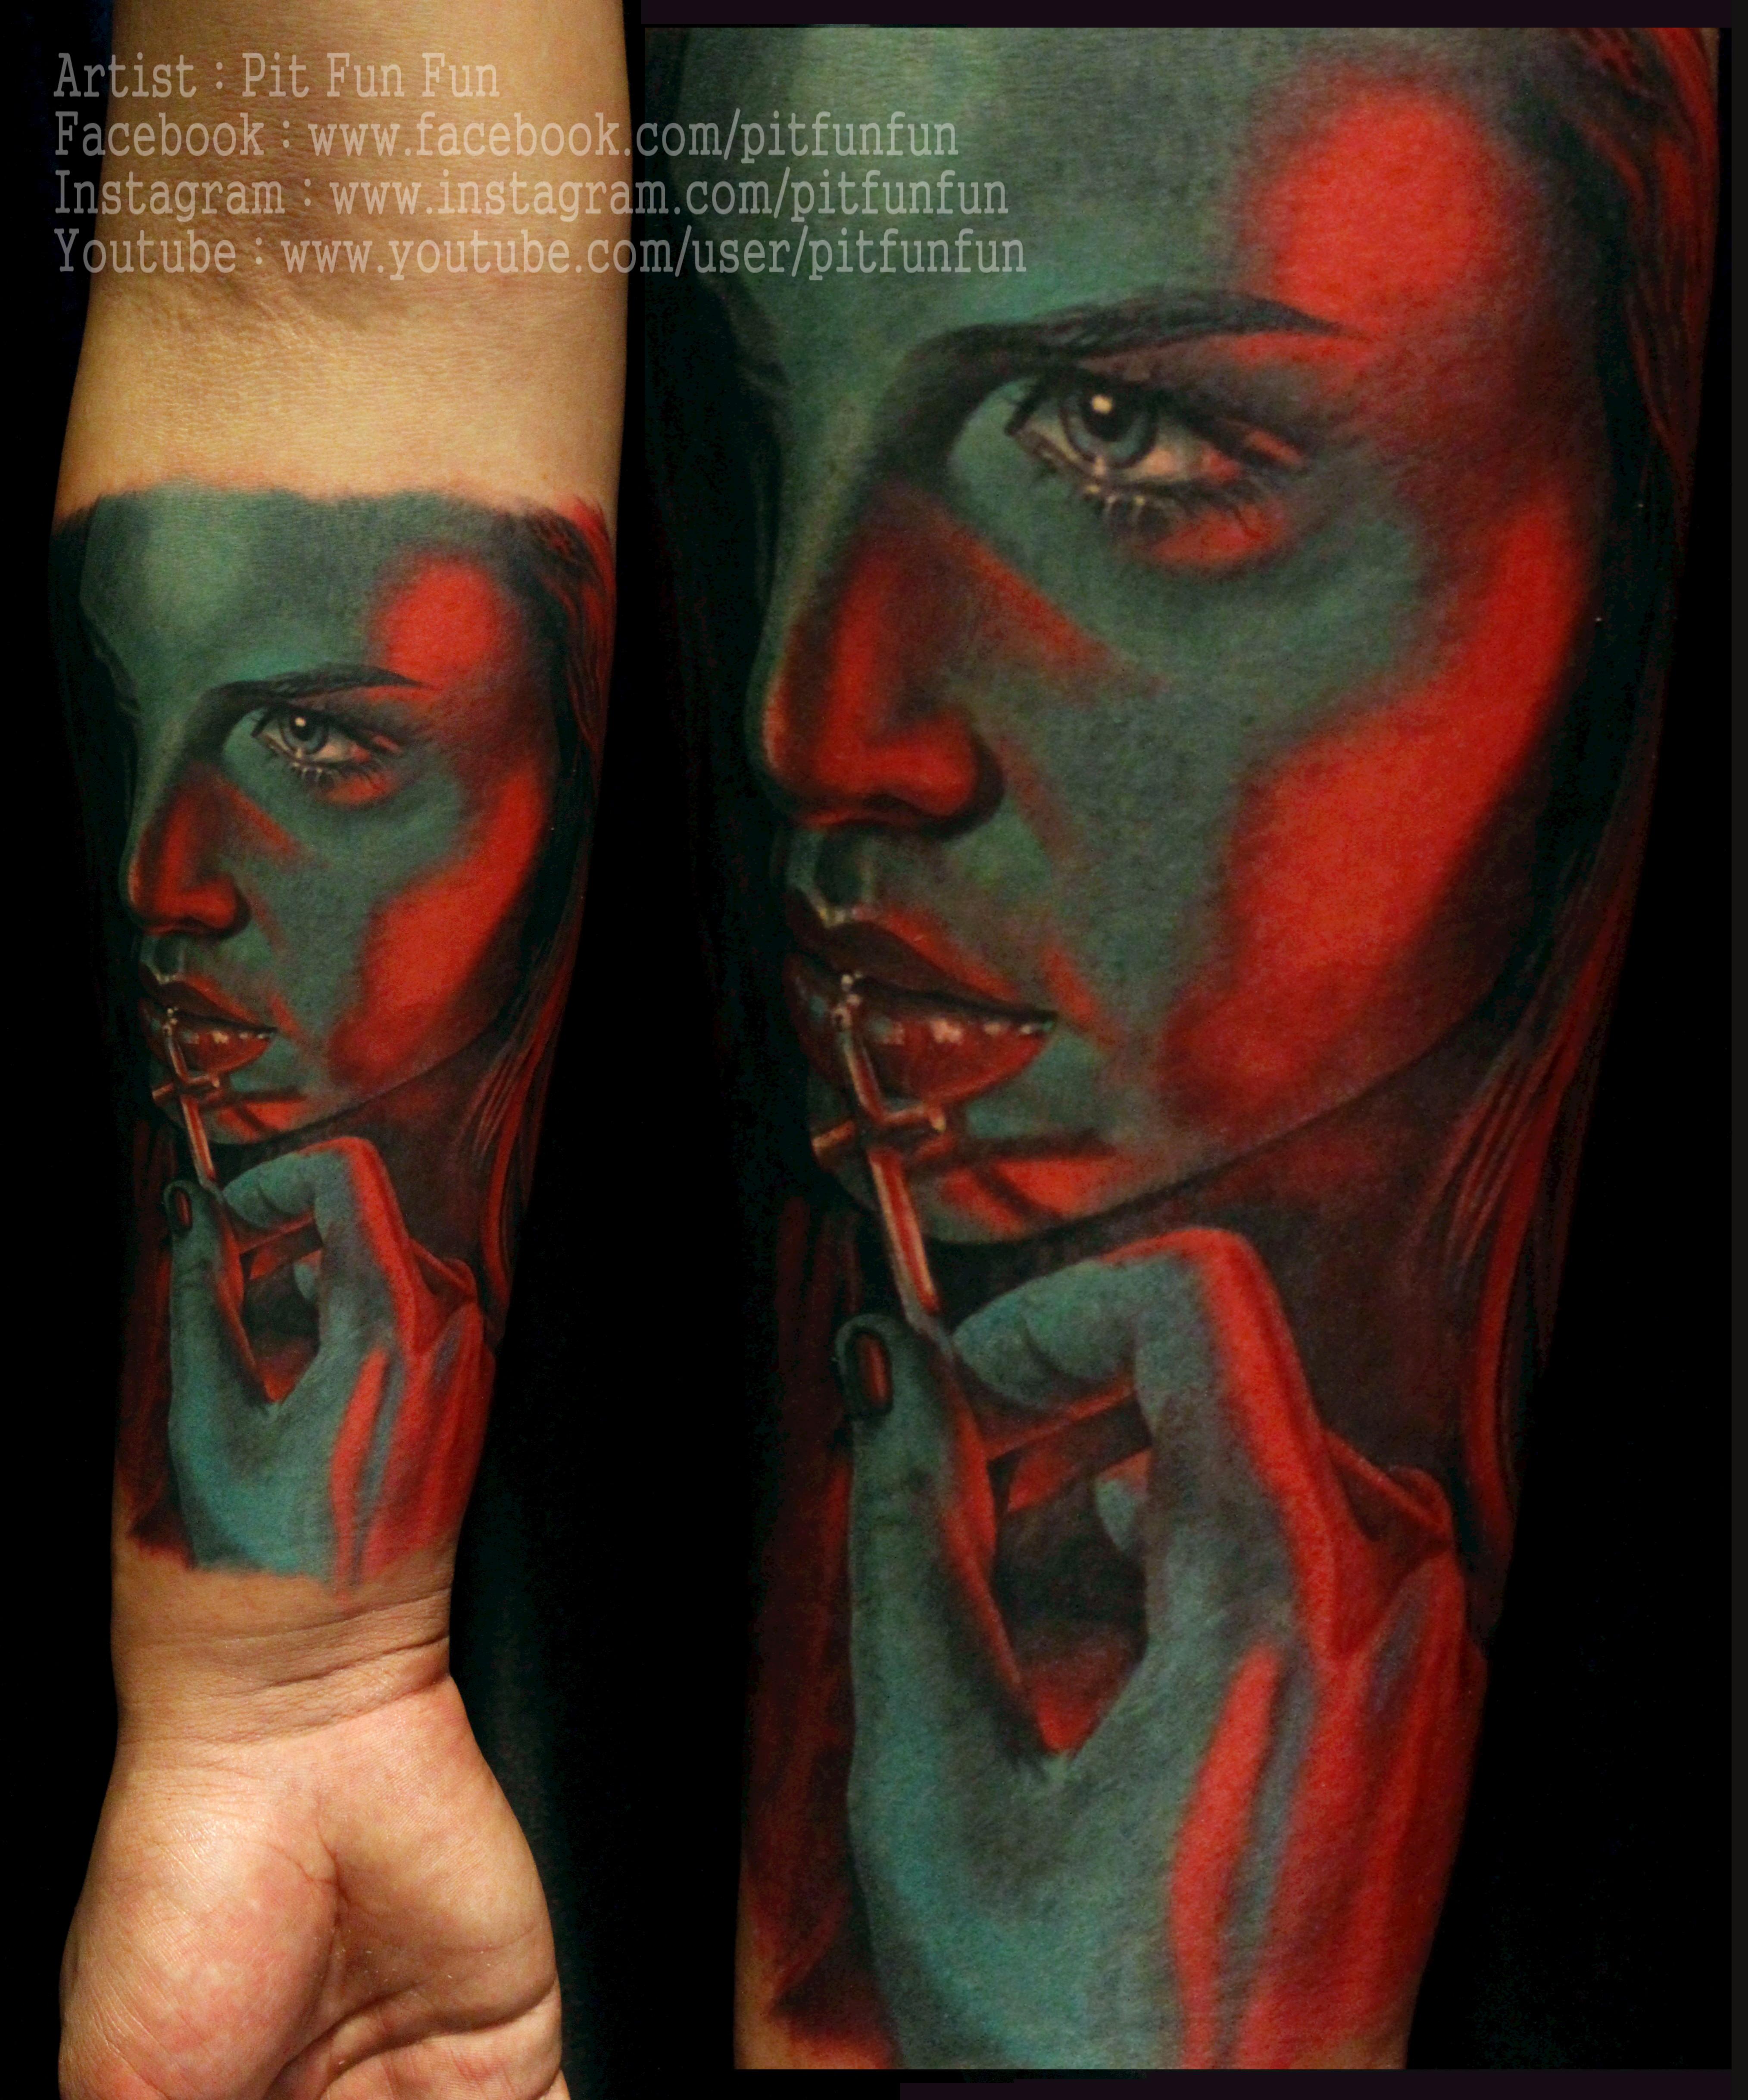 Color art facebook - Color Portrait By Www Facebook Com Pitfunfun Forearm